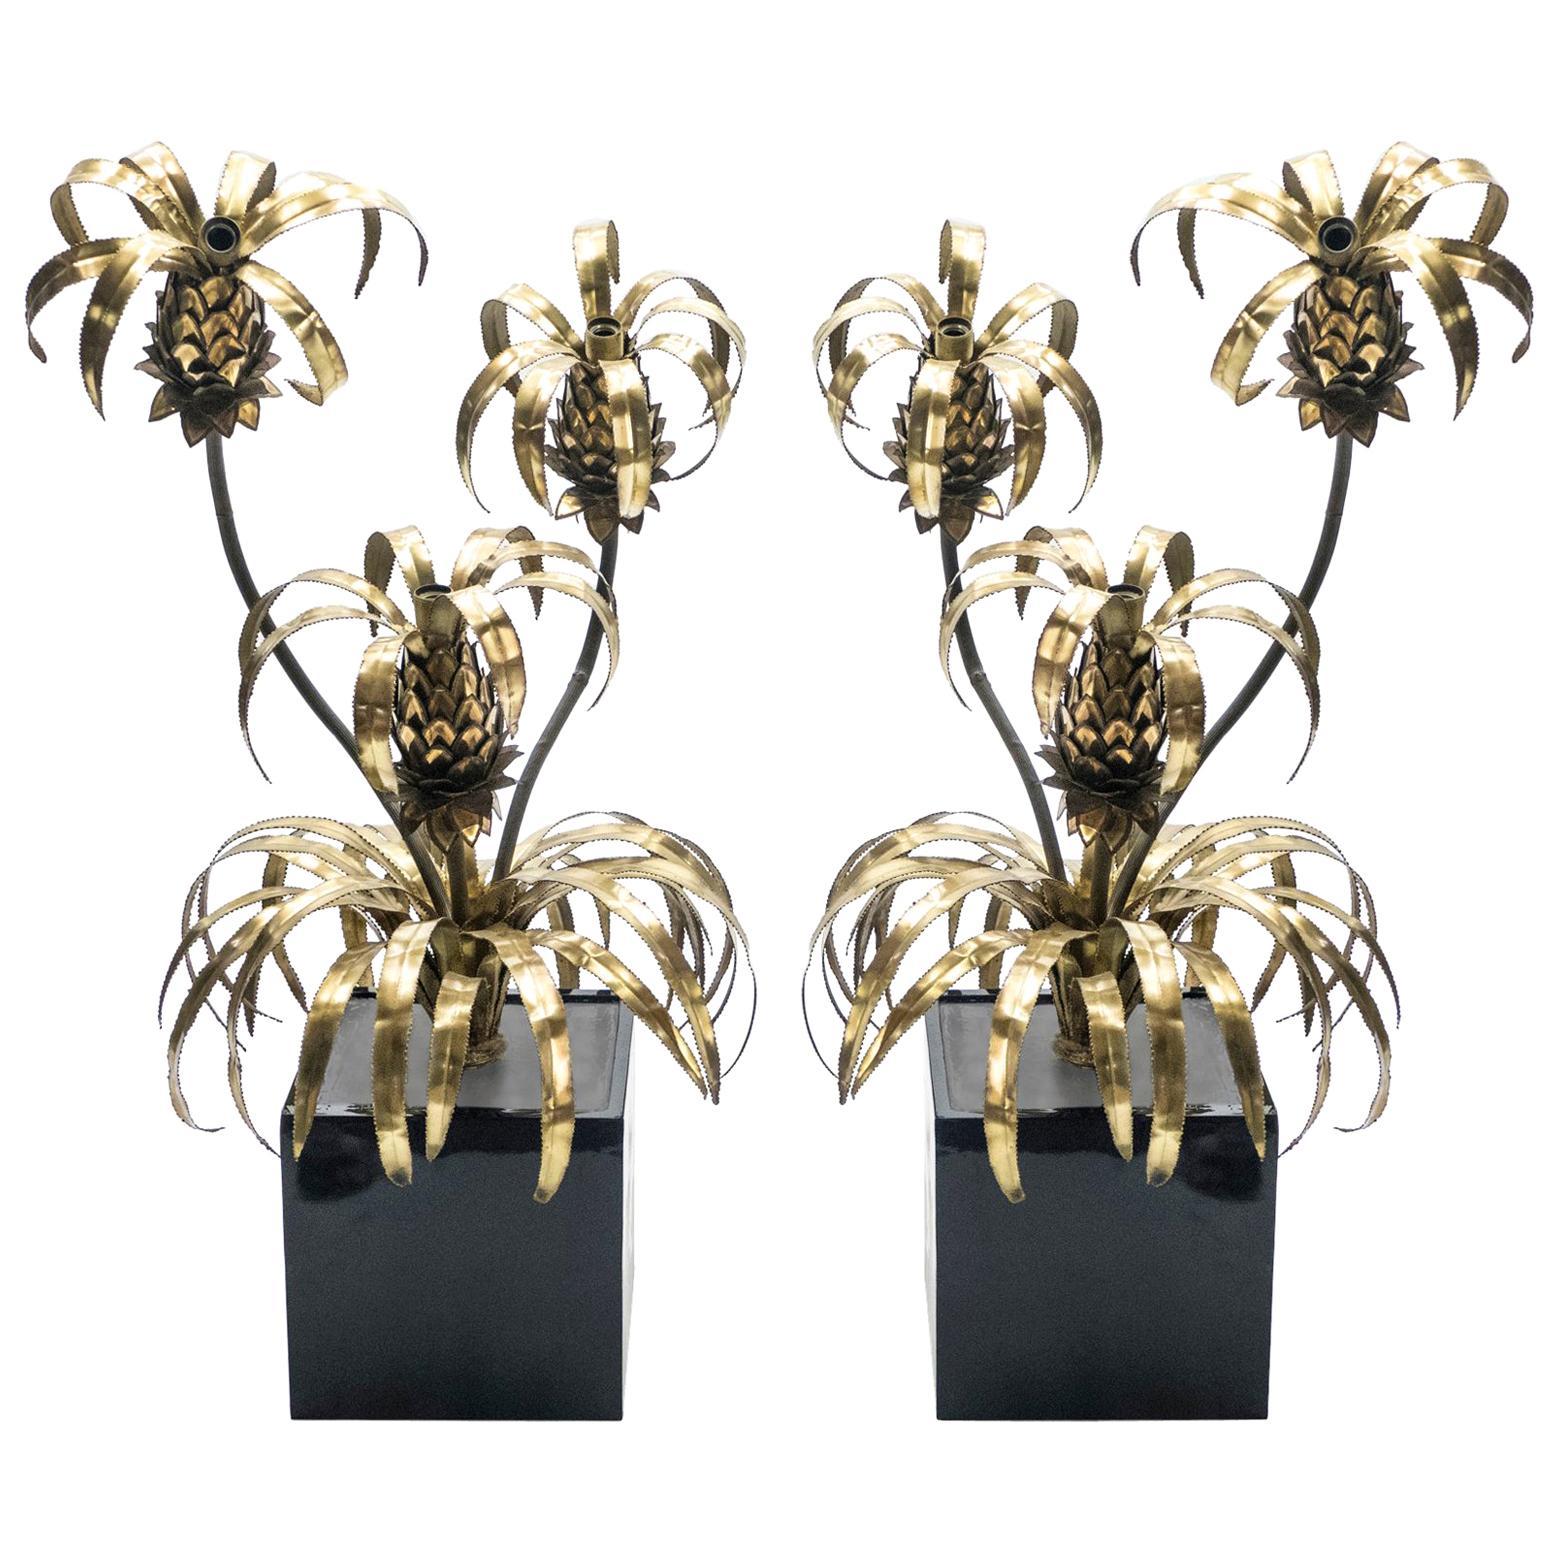 Rare Pair of Brass Maison Jansen Pineapple Floor Lamps, 1970s